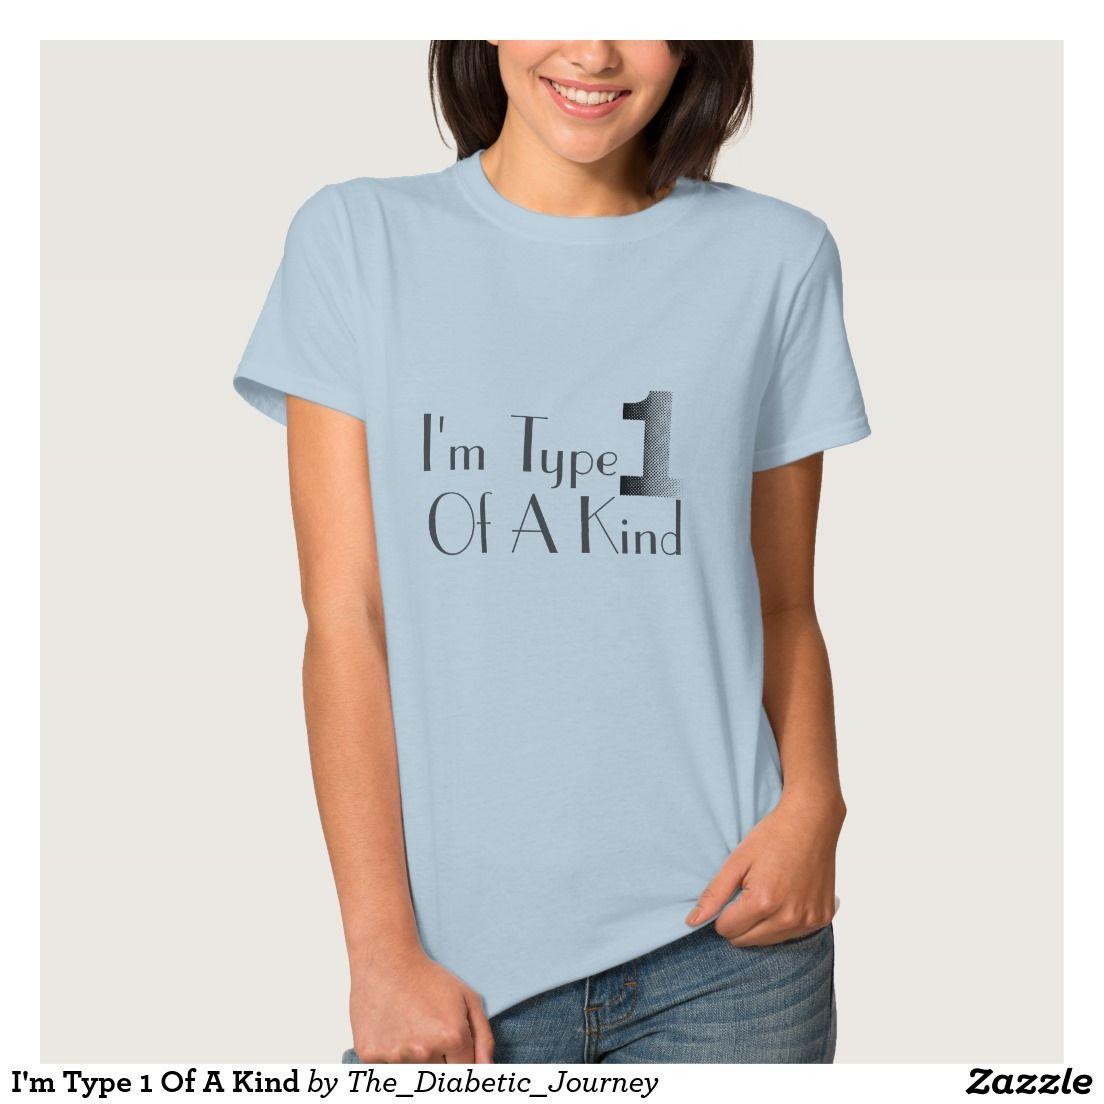 Google image result for http image spreadshirt com image server v1 - I M Type 1 Of A Kind Diabetes T Shirt